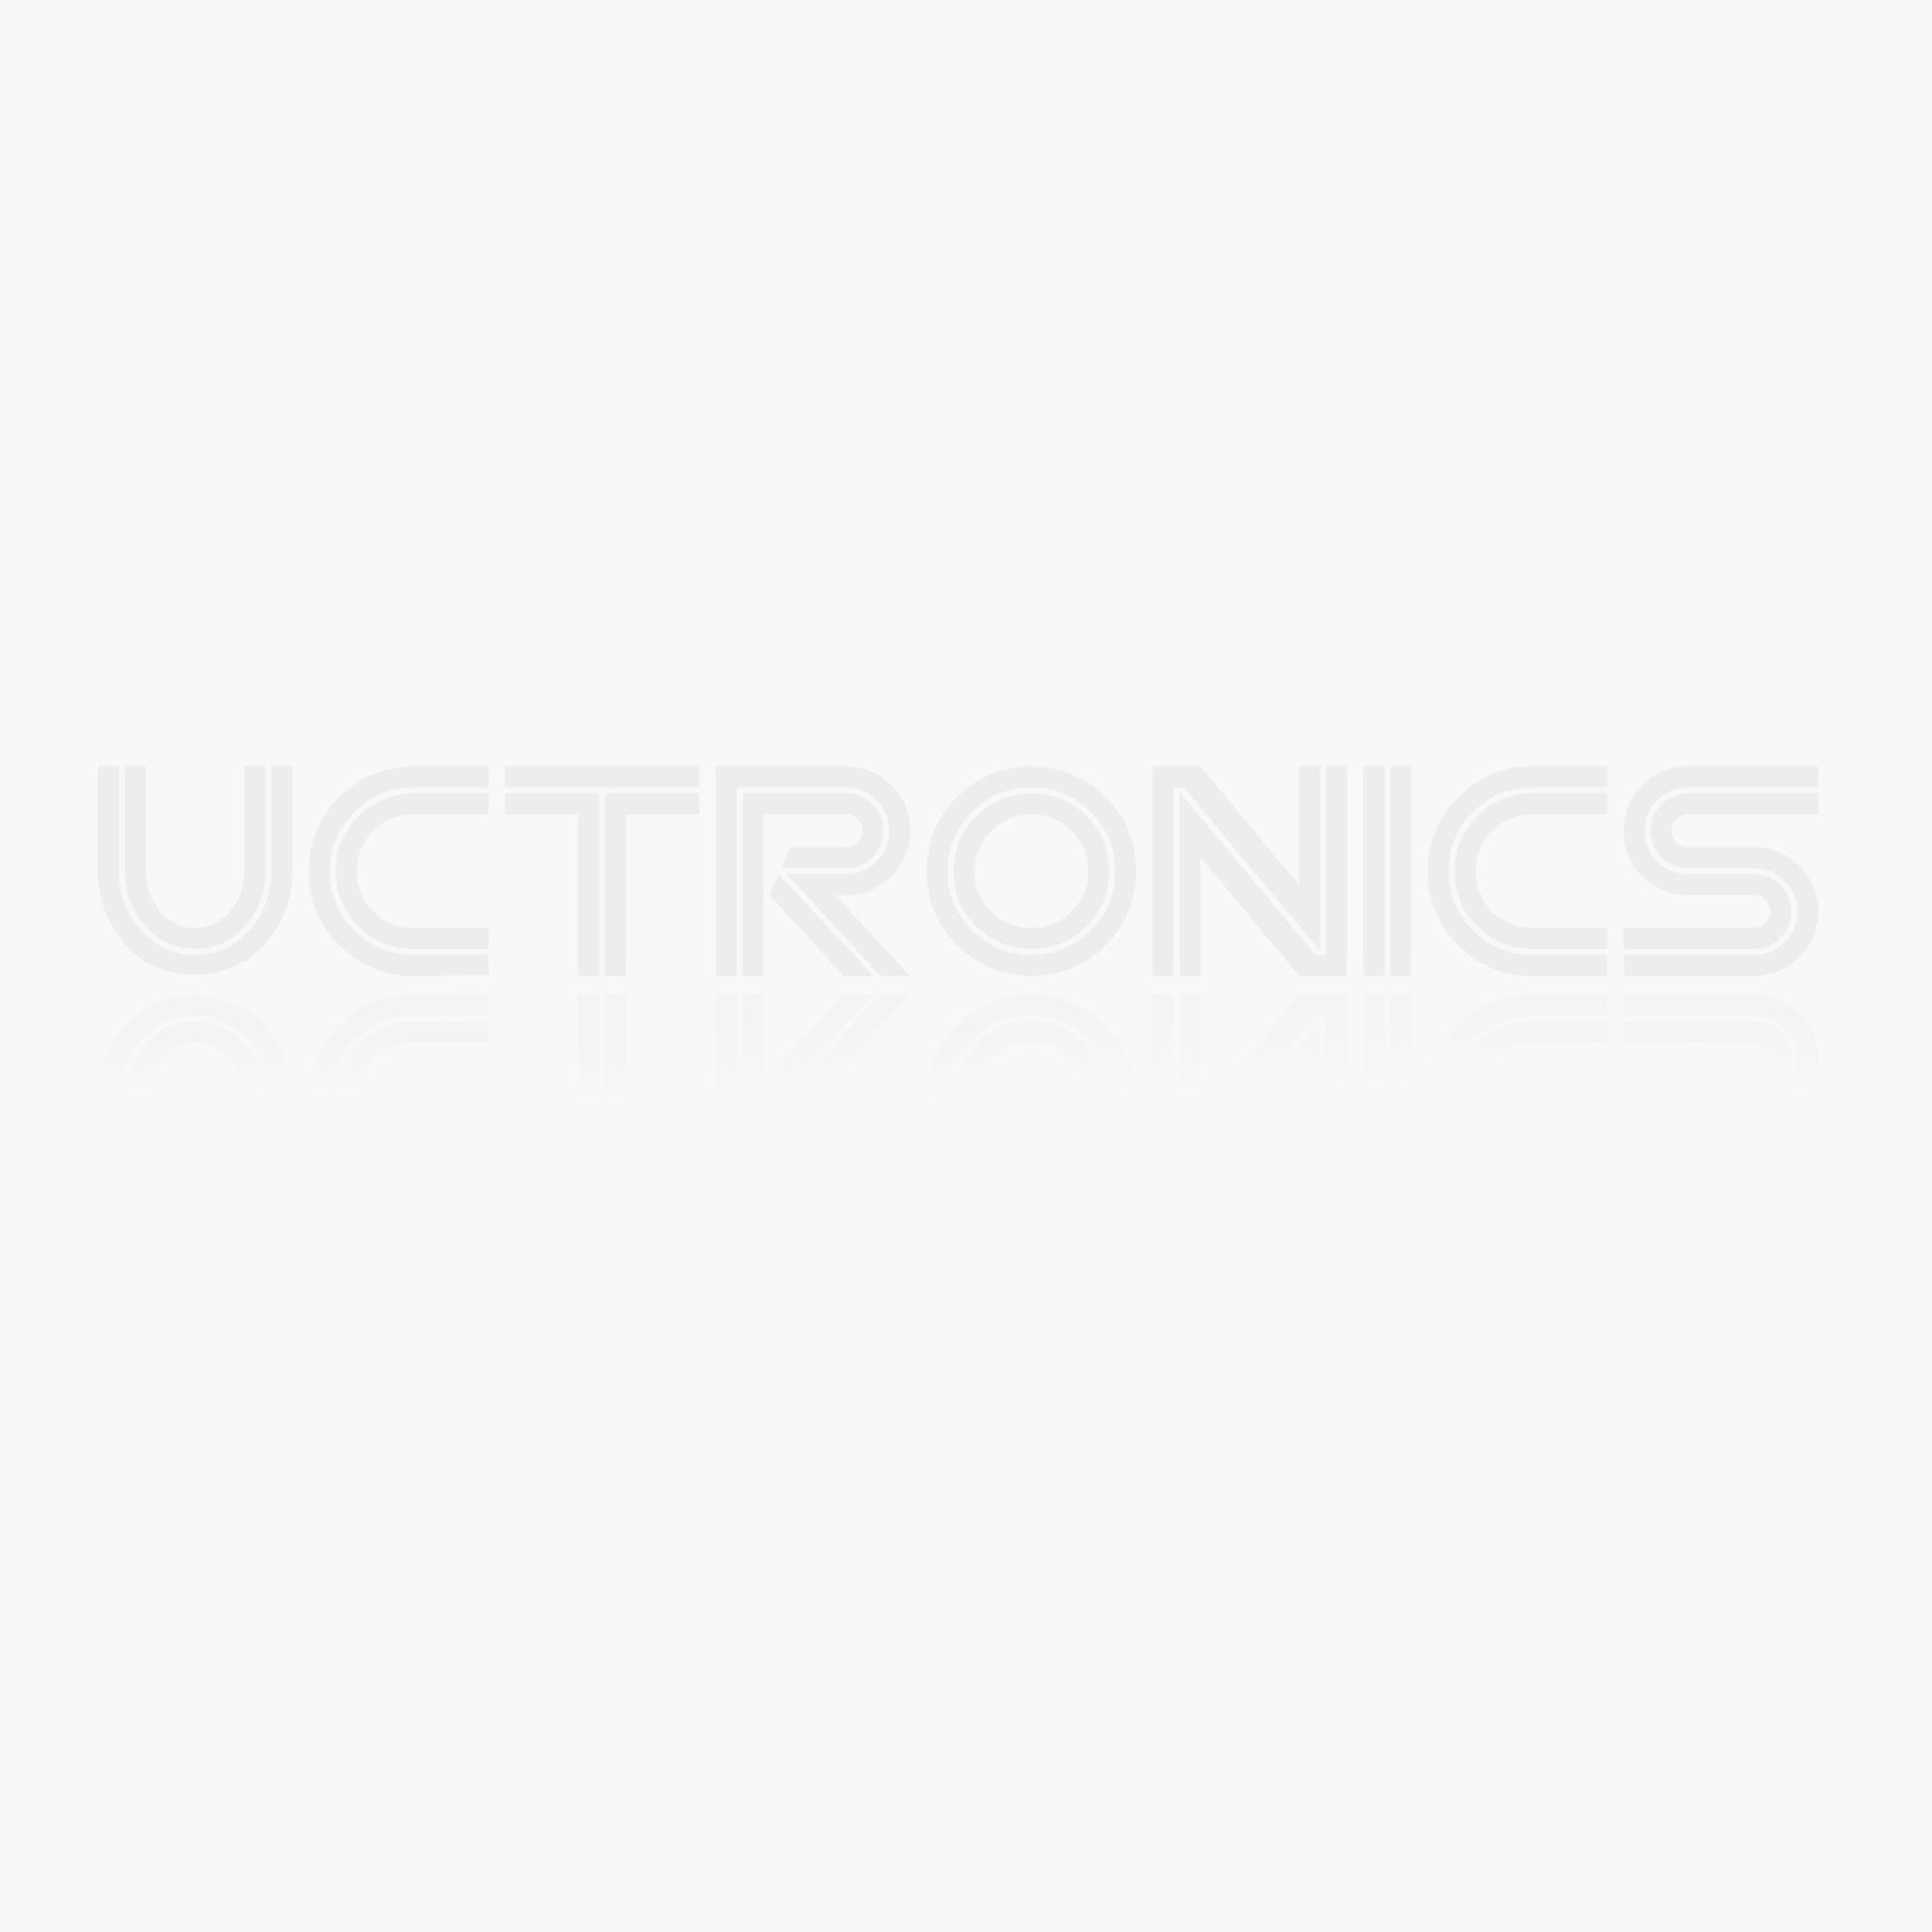 MPU-6050 3 Axis gyroscope + accelerometer module